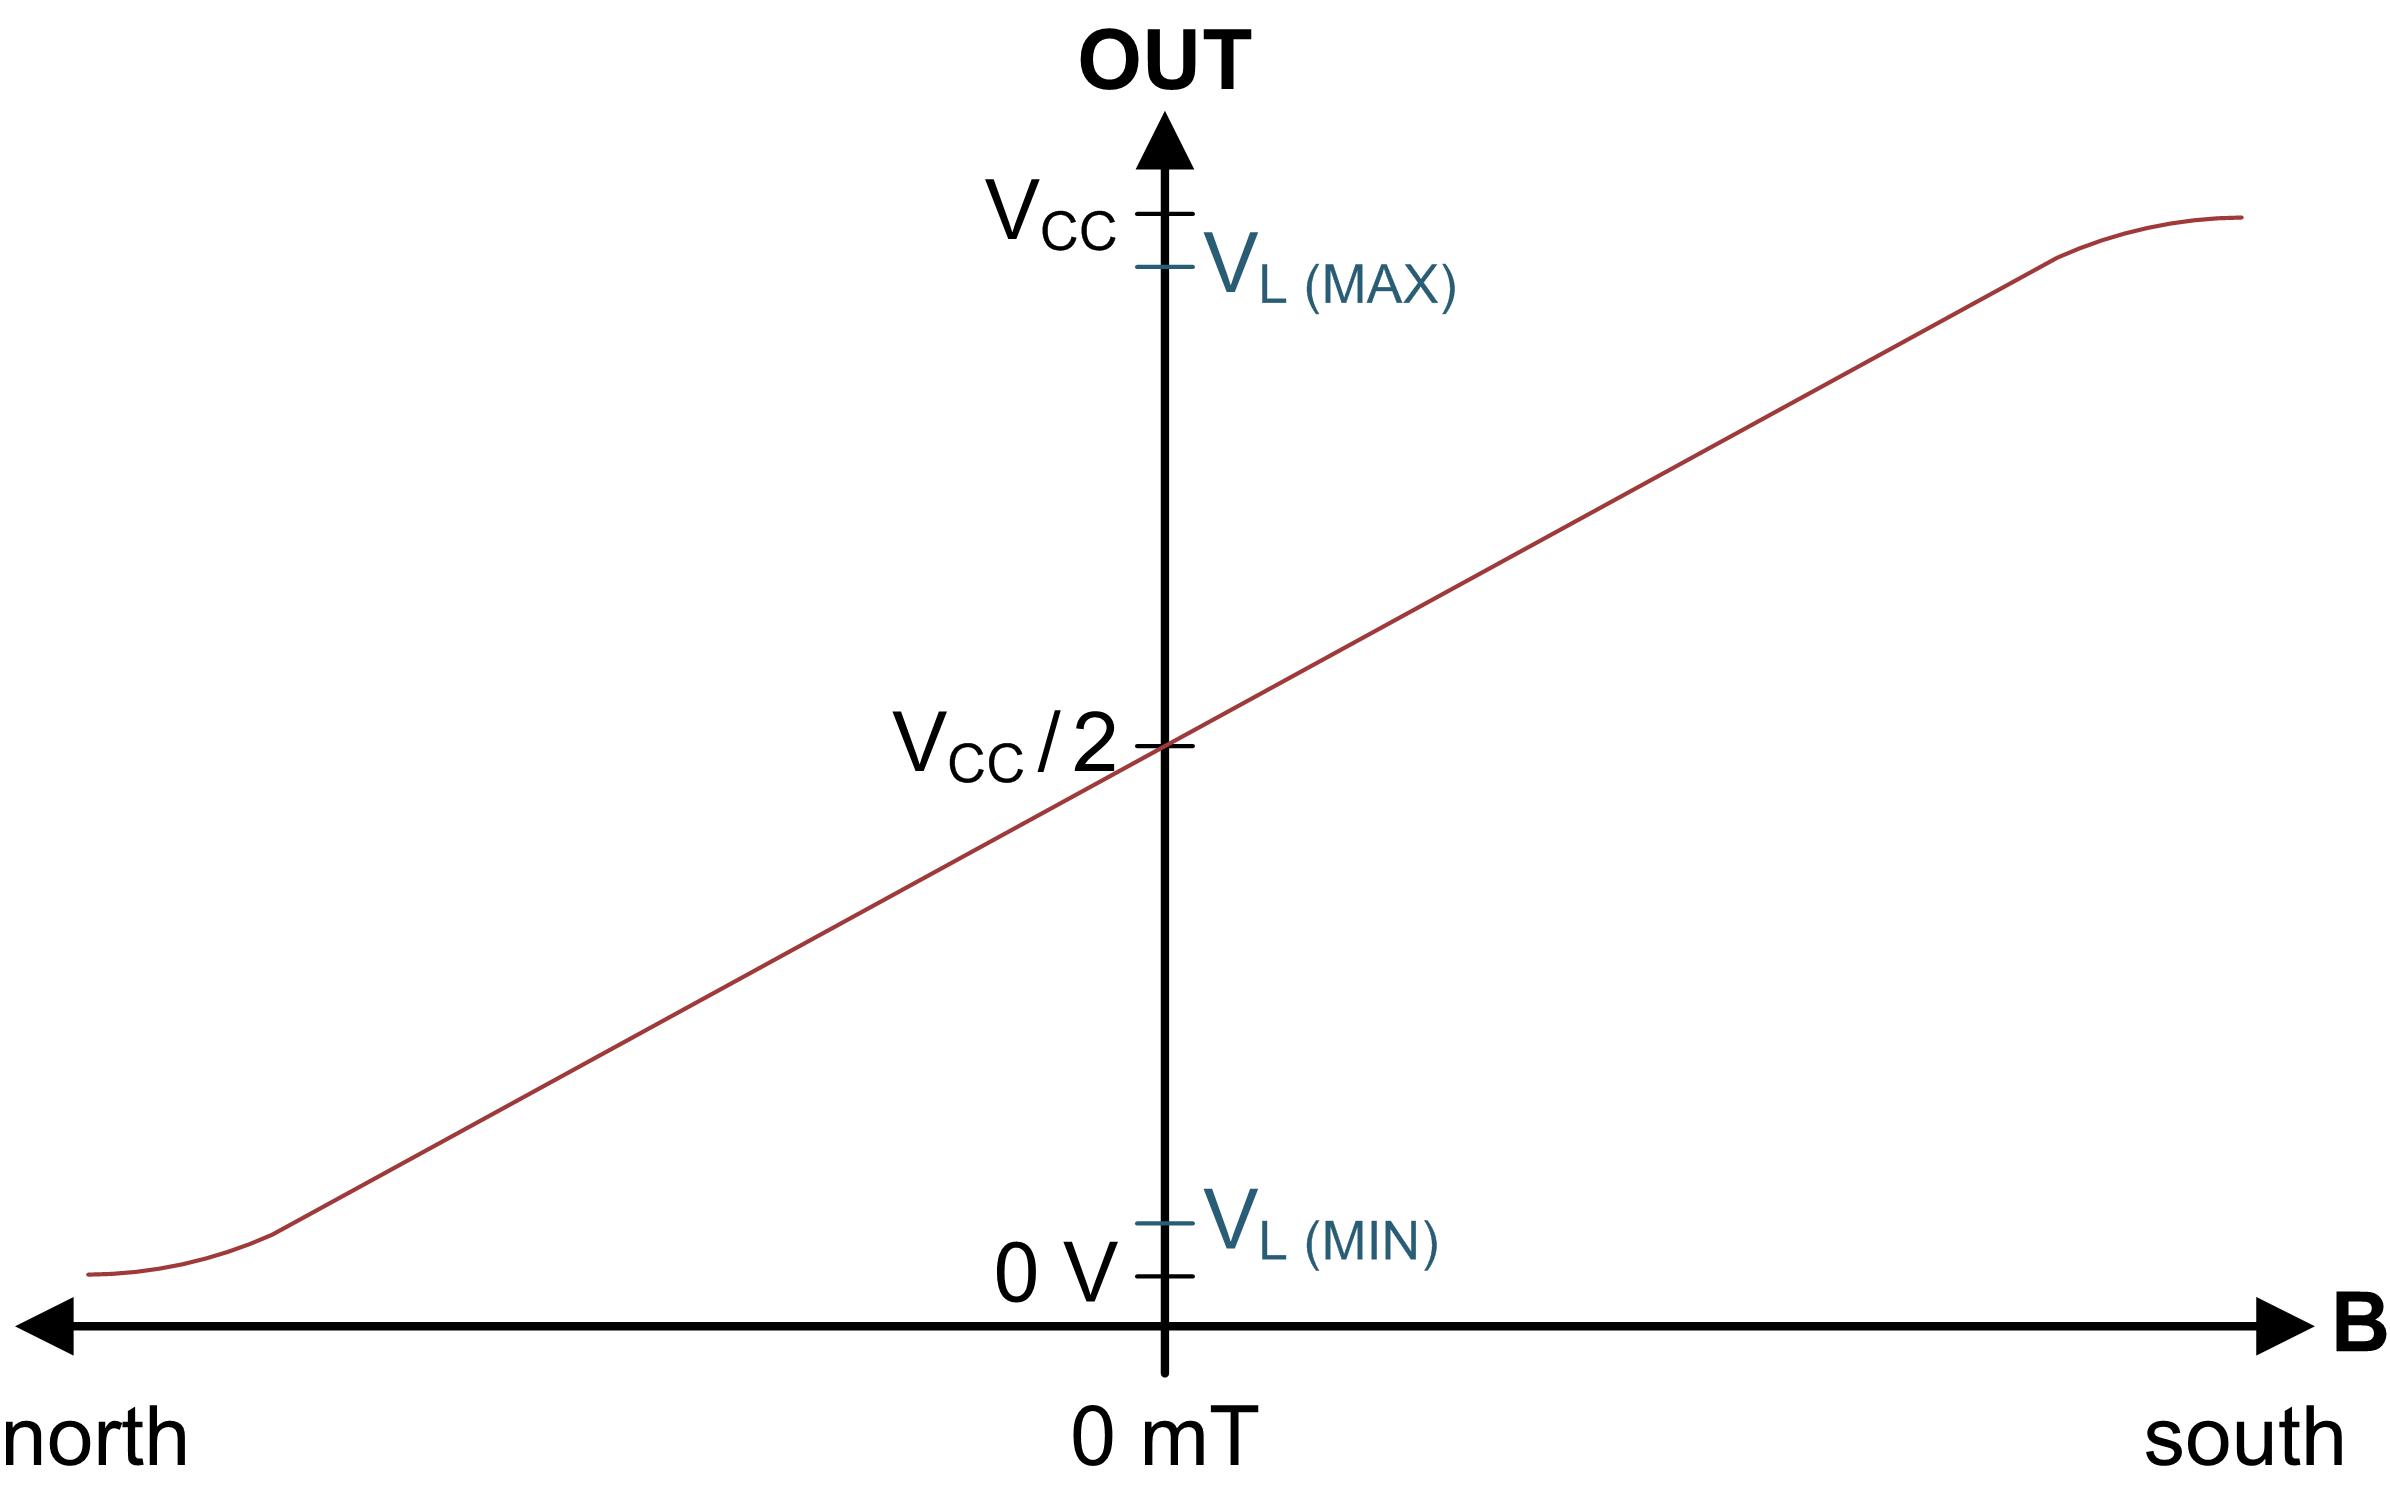 Figure 3: DRV5055 output